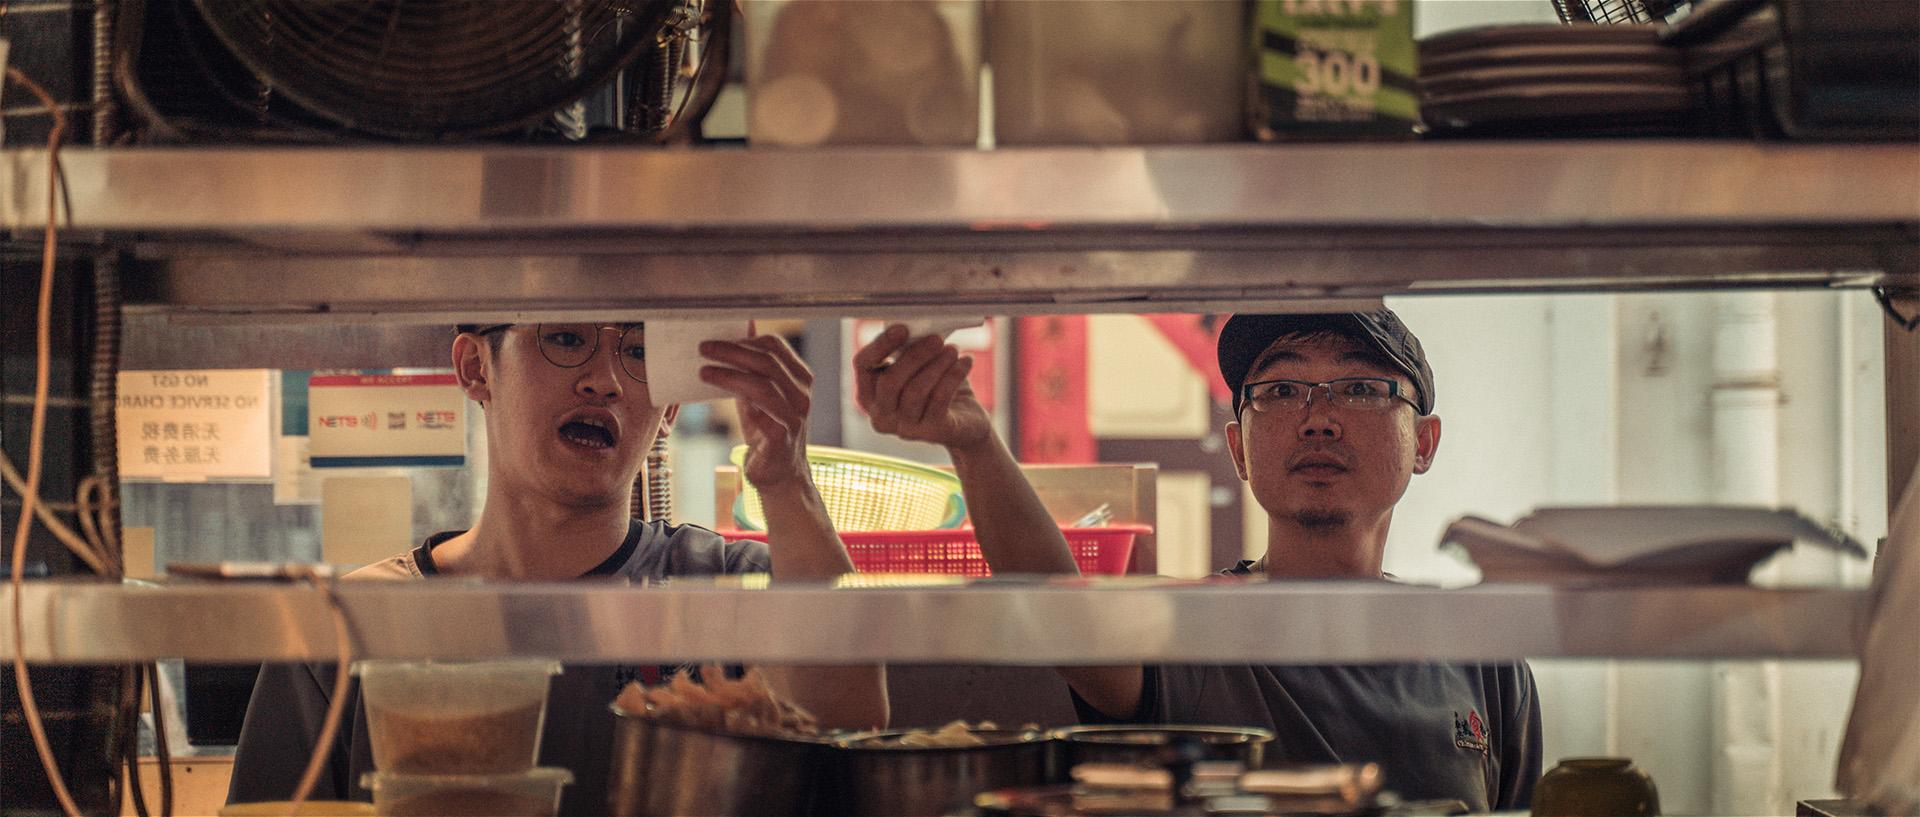 Nikko Pascua Travel photography Singapore_01399.jpg